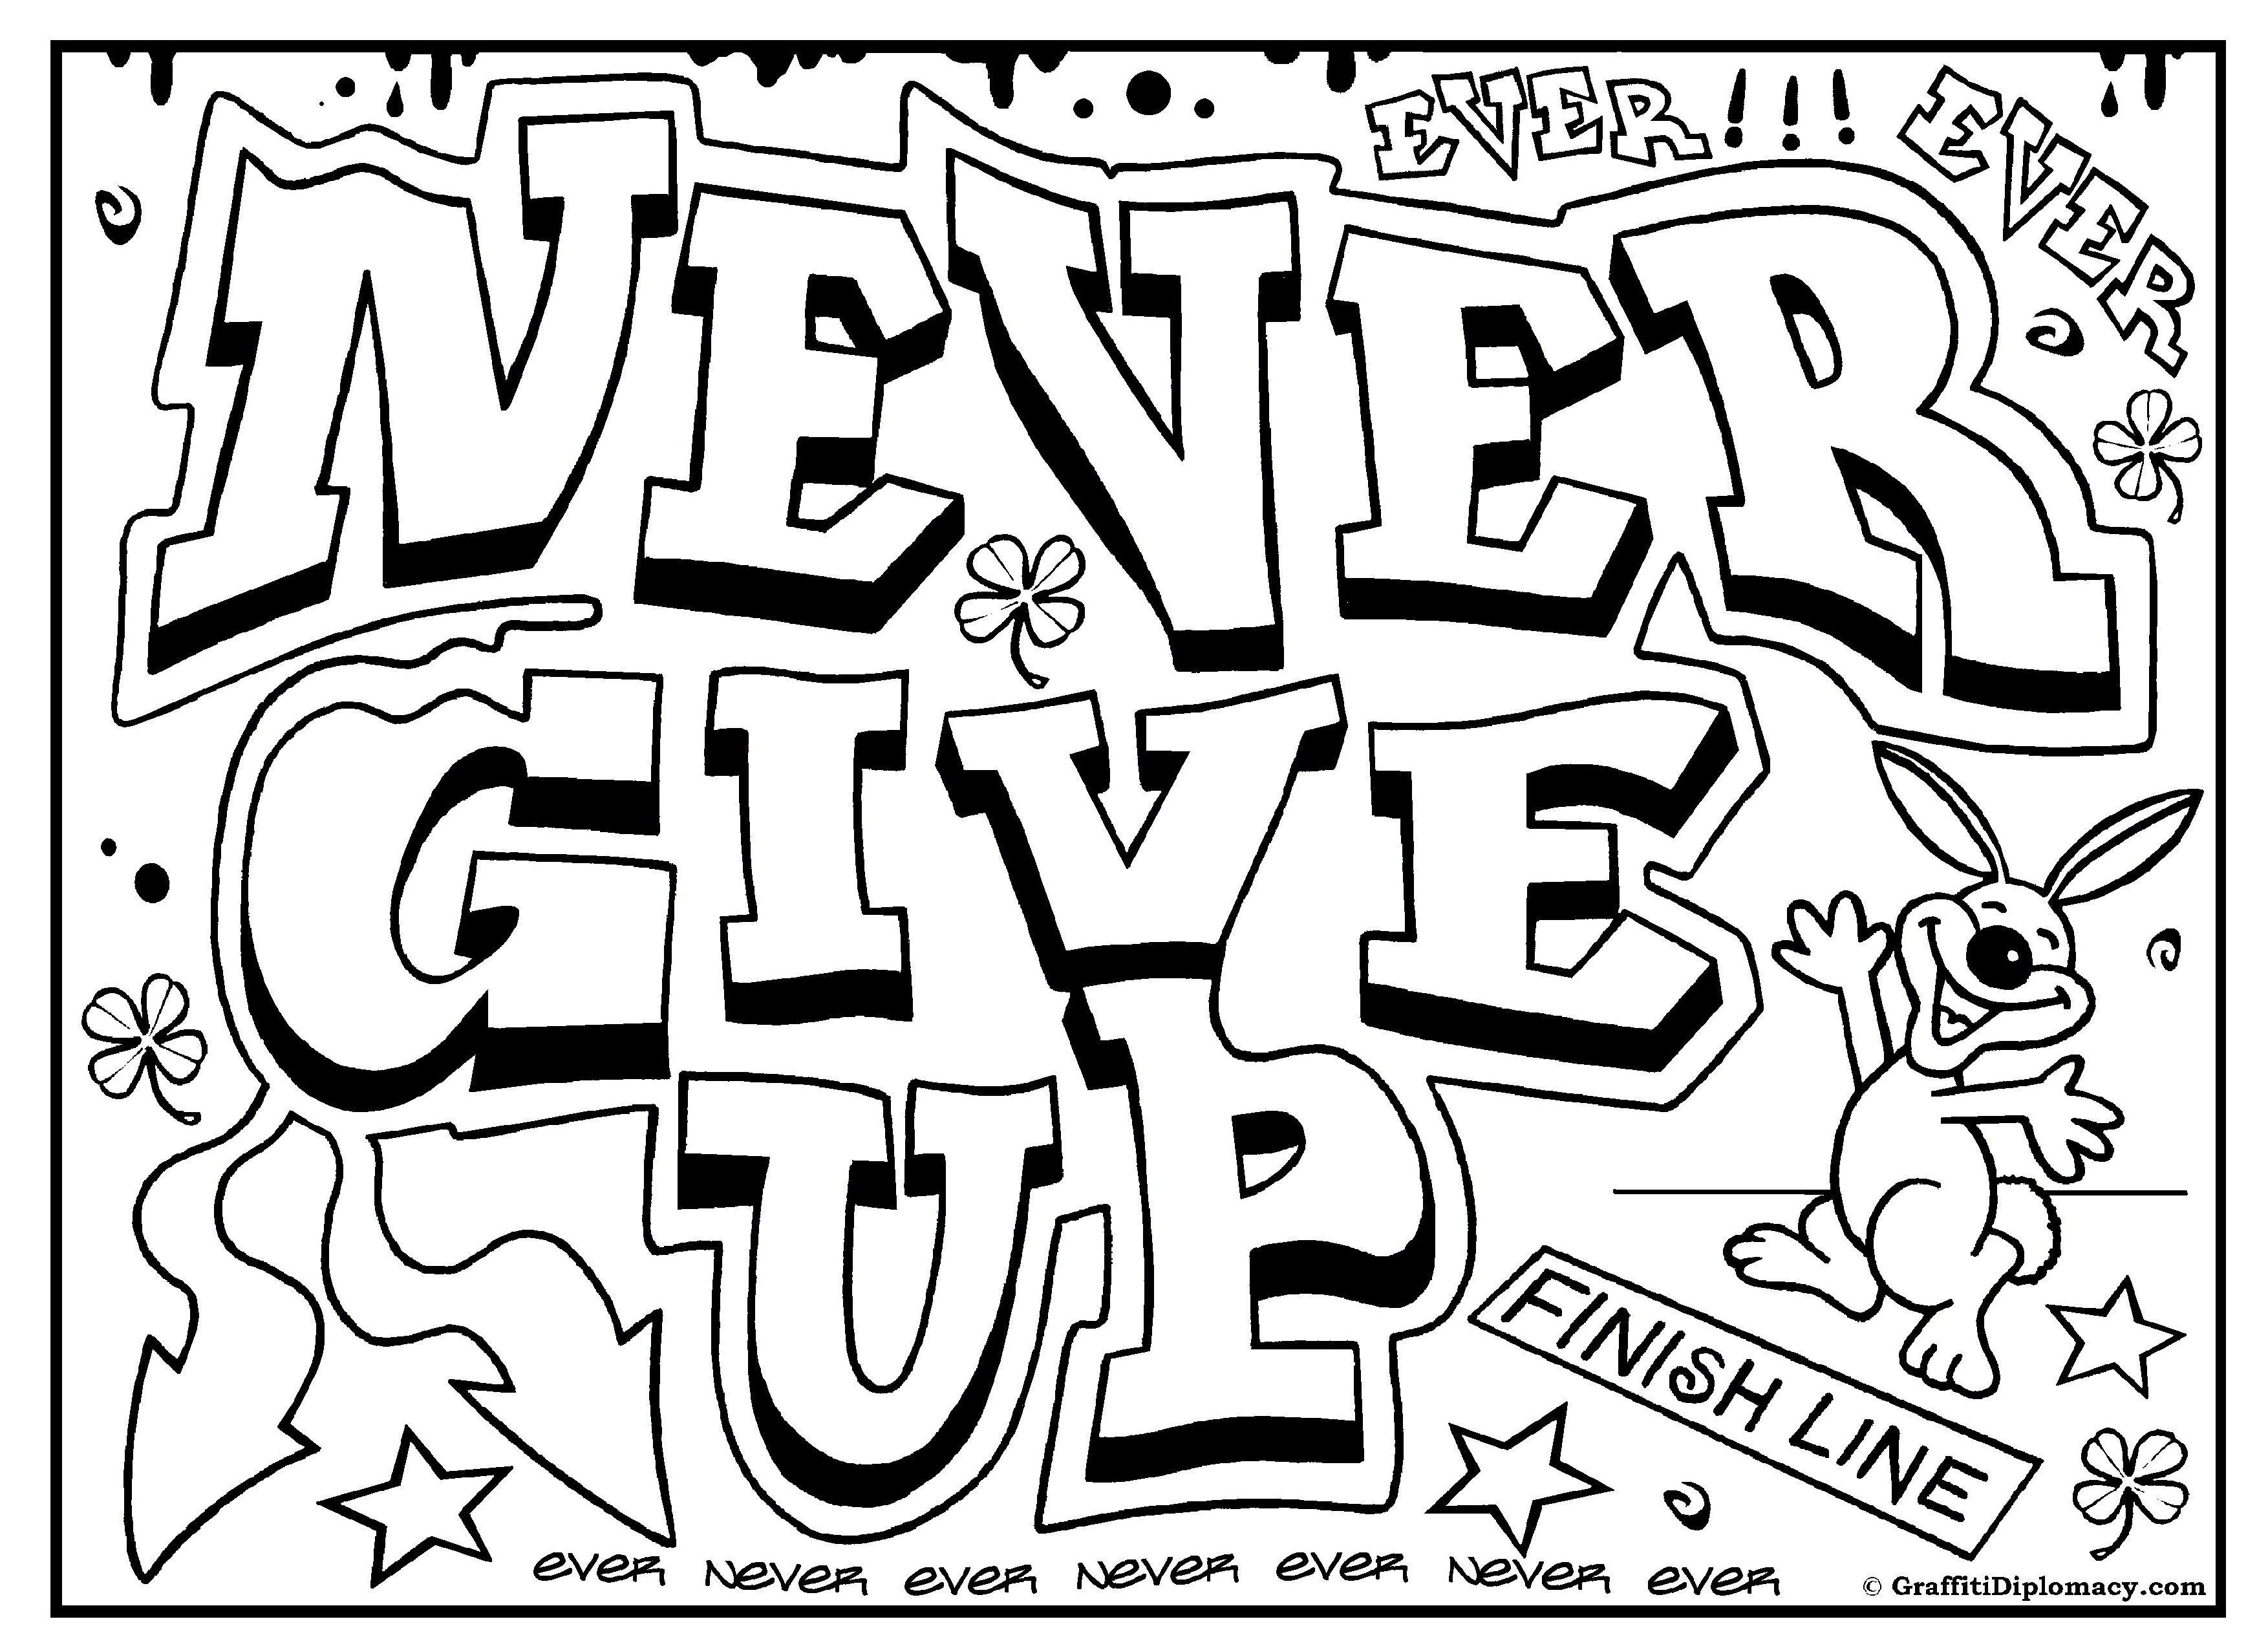 Never Give Up Graffiti, Free Printable Colouring Sheet   Free - Free Printable Coloring Pages On Respect